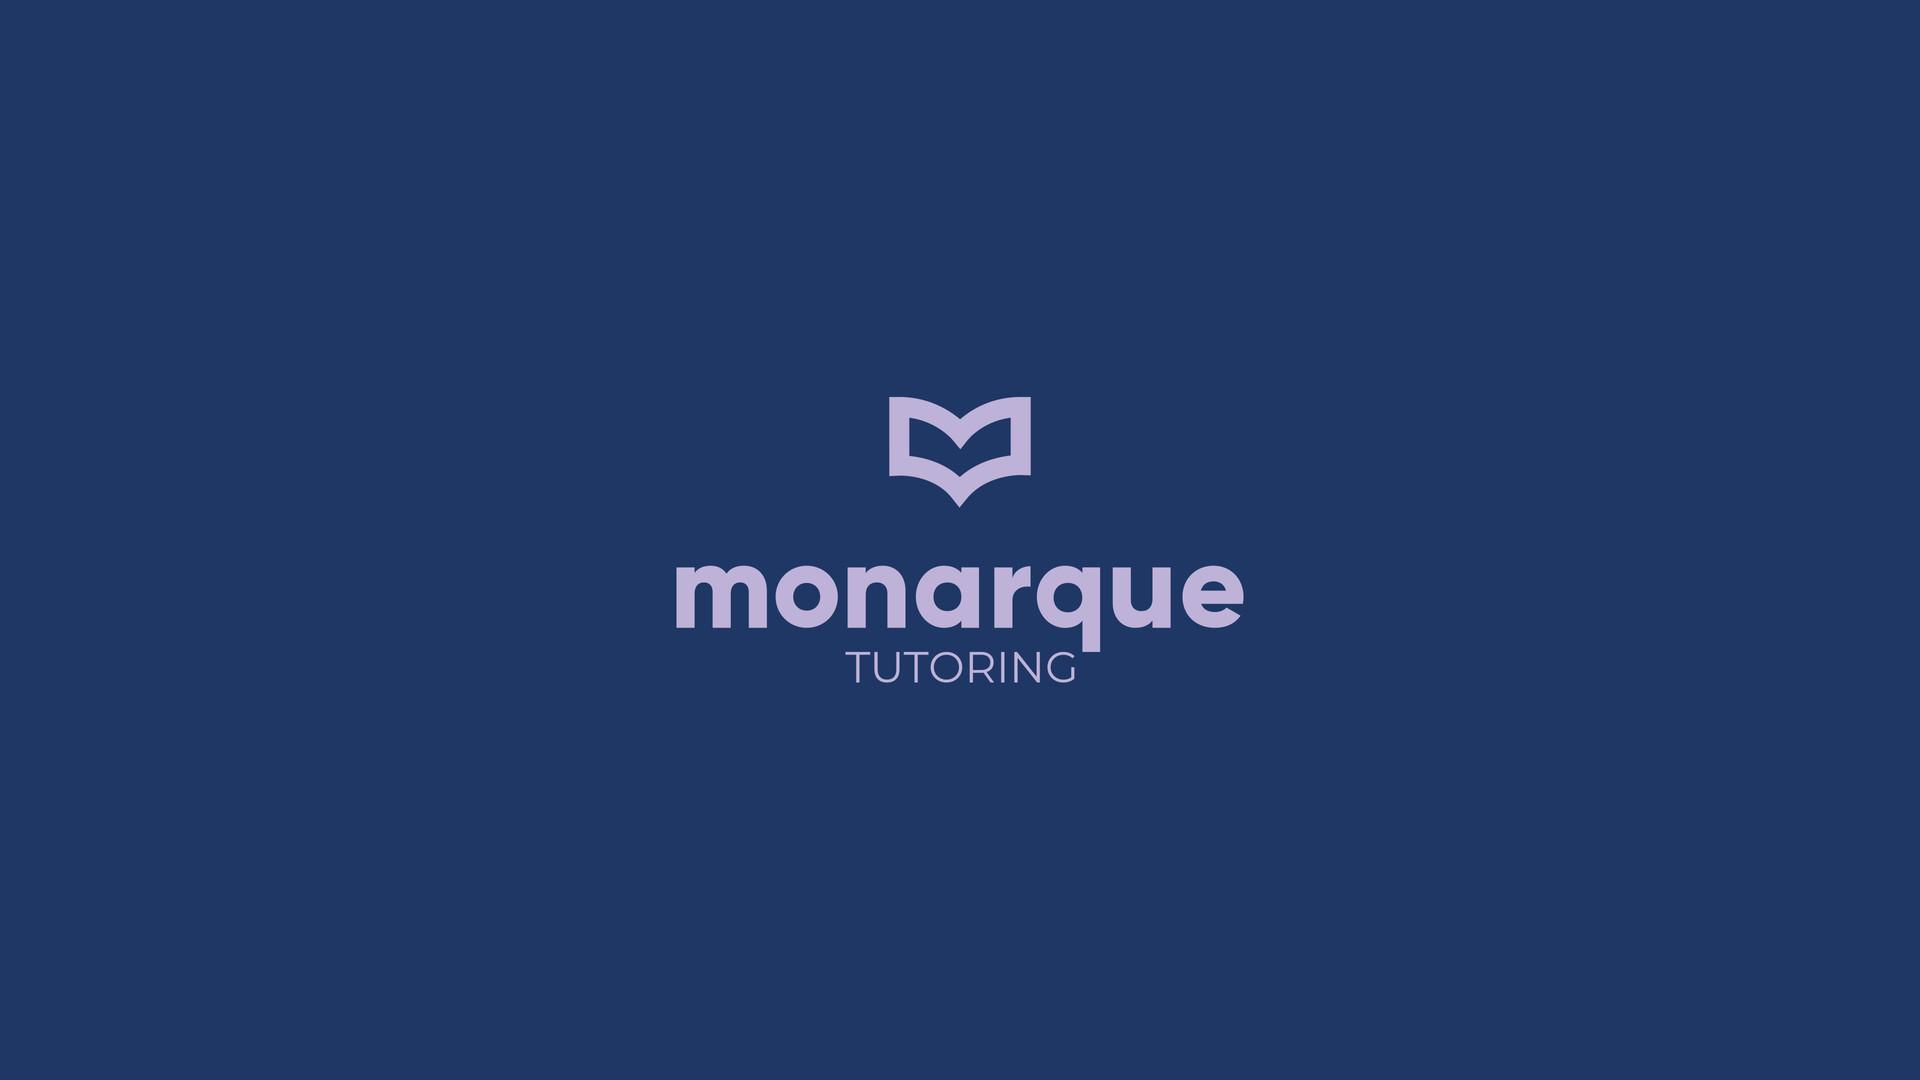 Monarque Cover.jpg